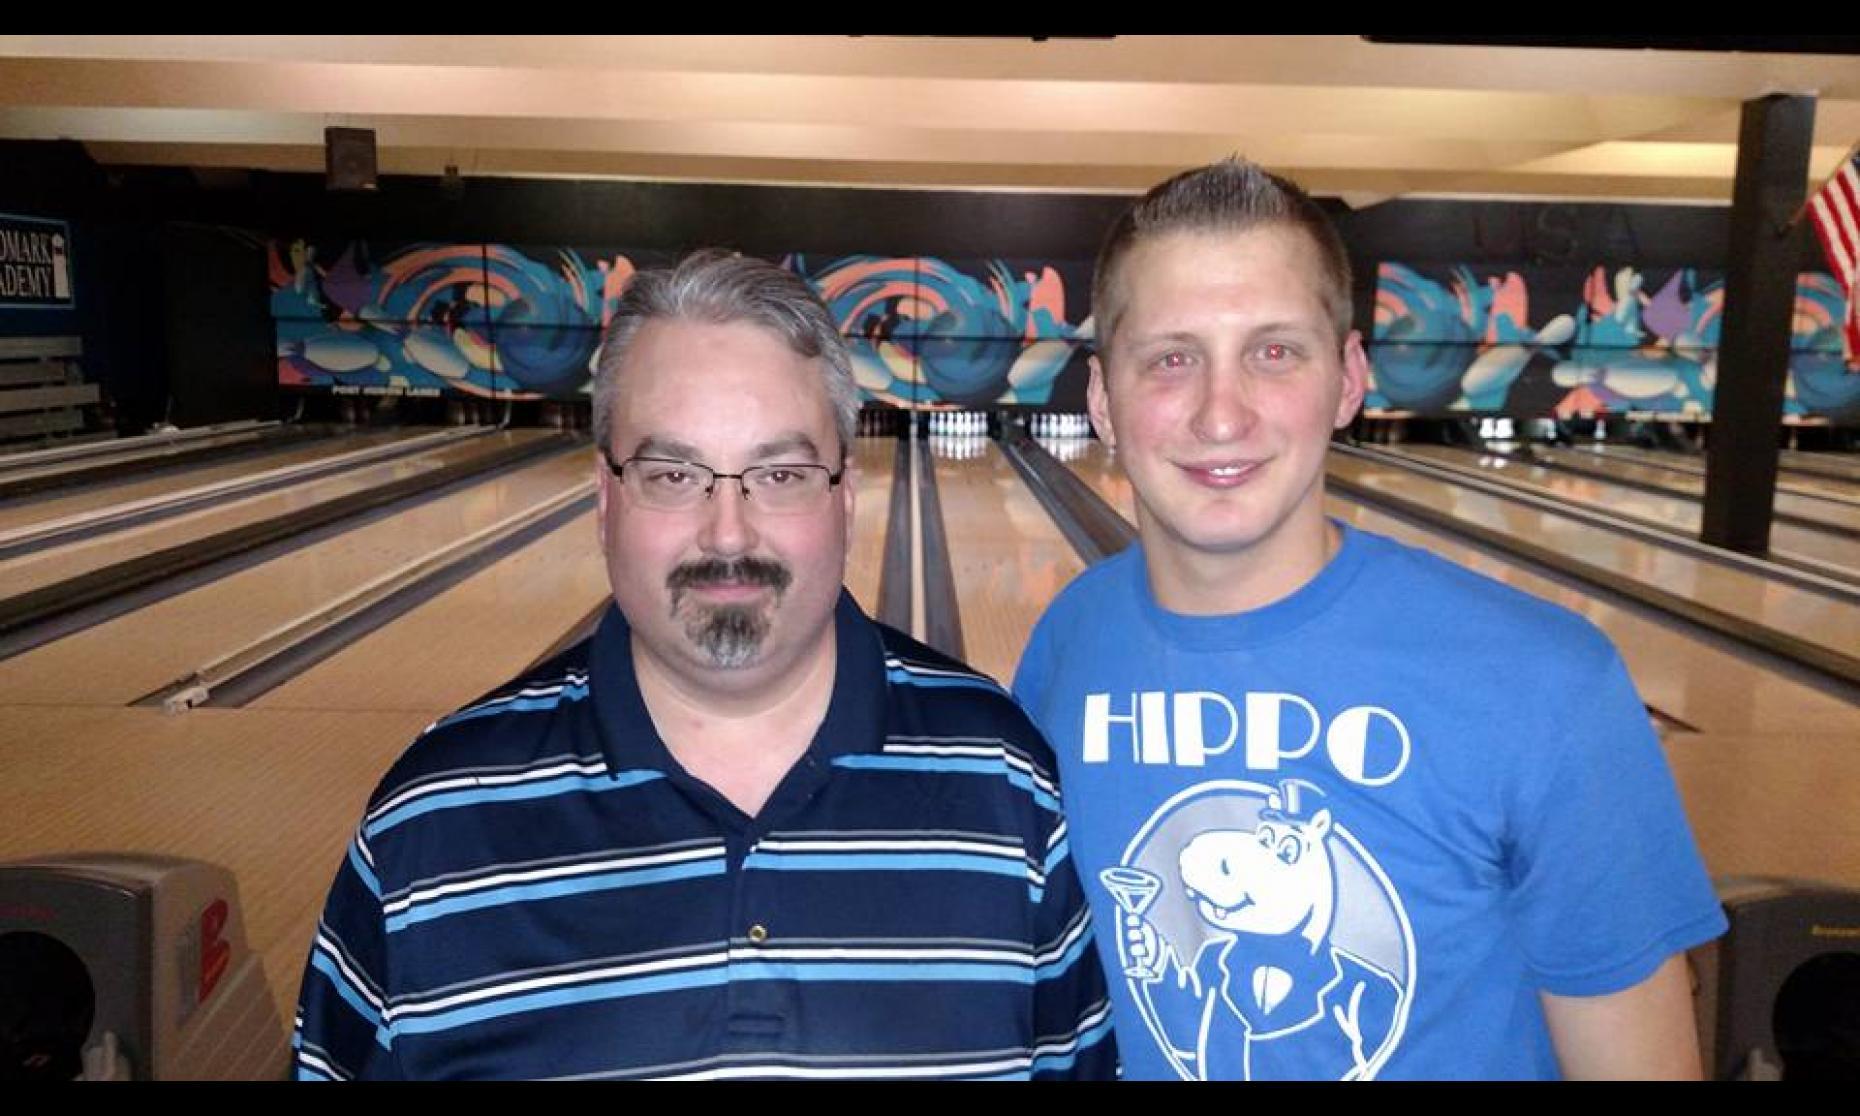 Runner-Up Brian Regan & Champion Josh Jablonski